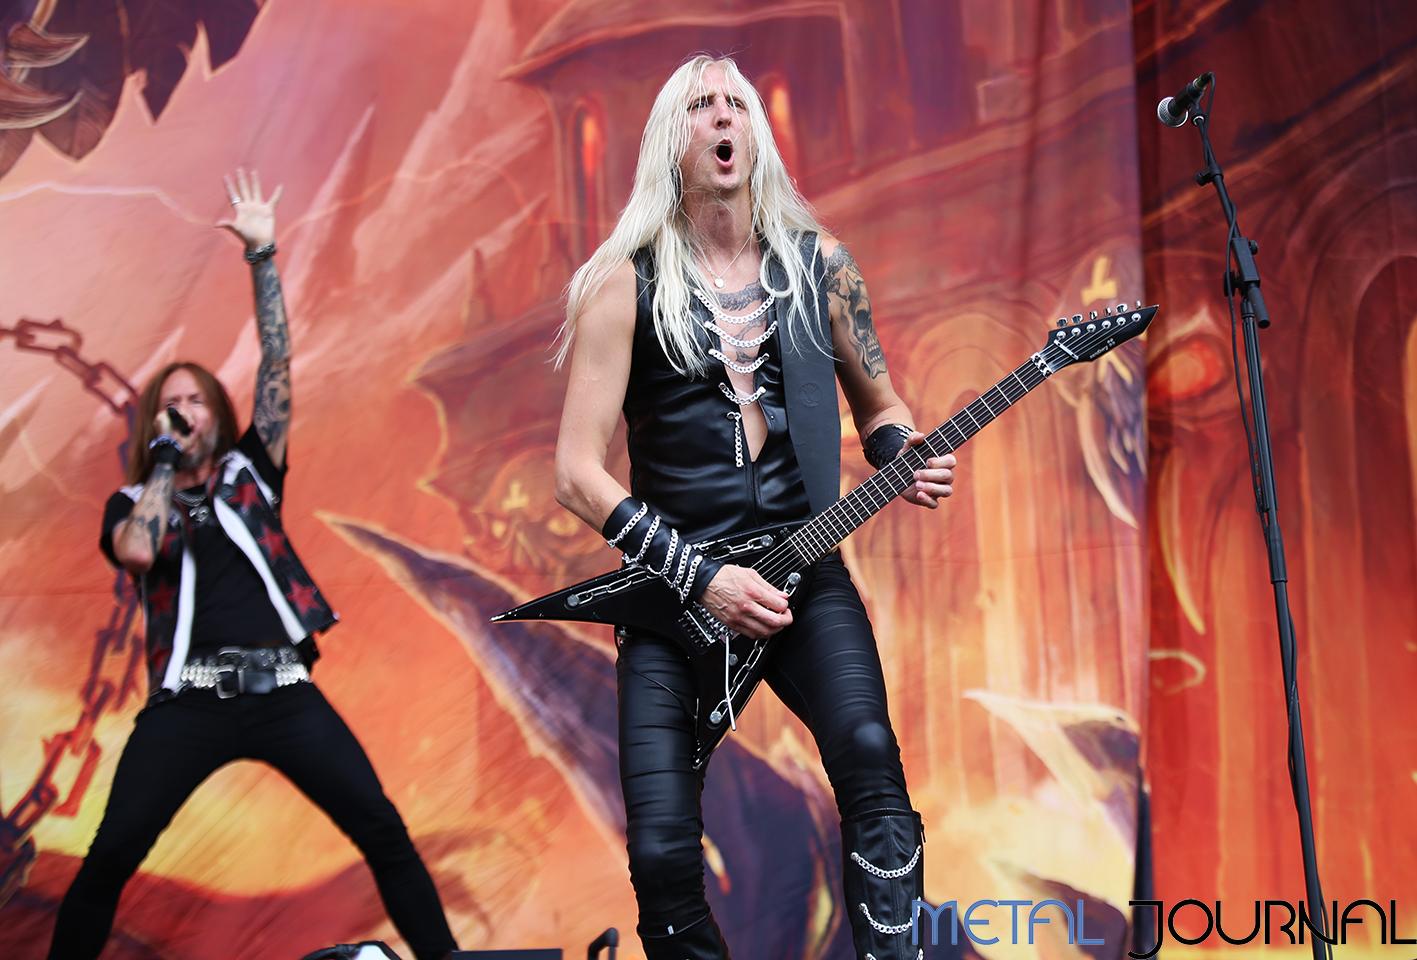 hammerfall - metal journal rock fest barcelona 2019 pic 7